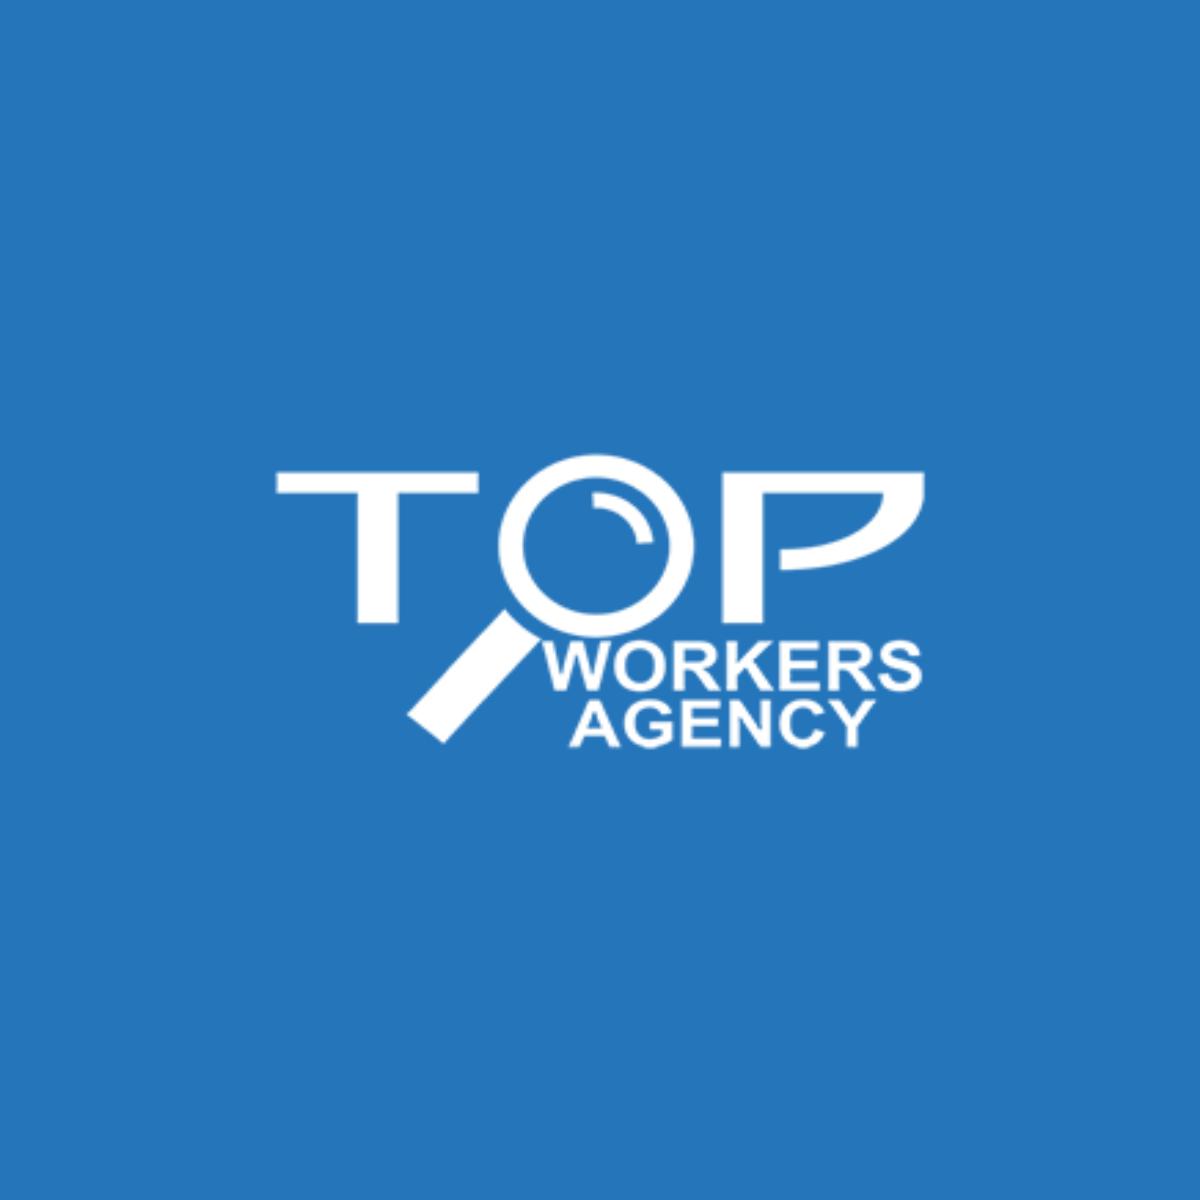 TOP WORKERS AGENCY